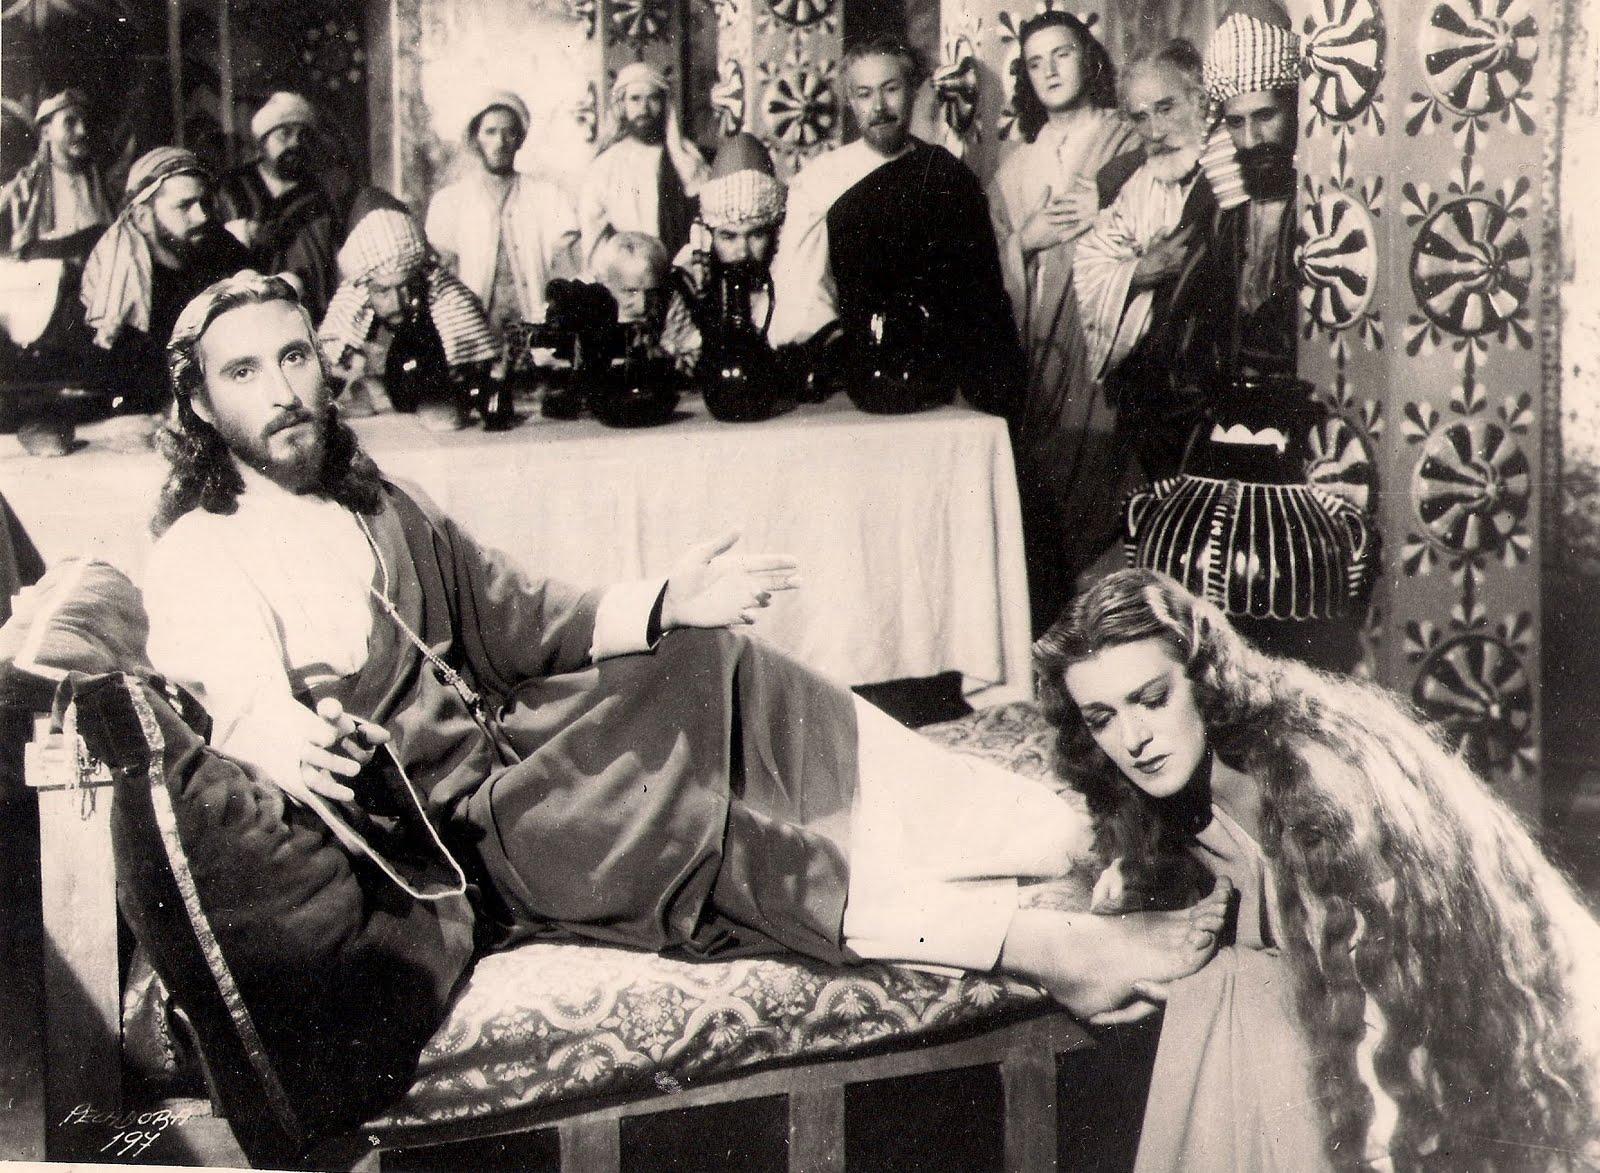 Luis Alcoriza, Rafael Banquells, Edmundo Espino, and Medea de Novara in María Magdalena, pecadora de Magdala (1946)